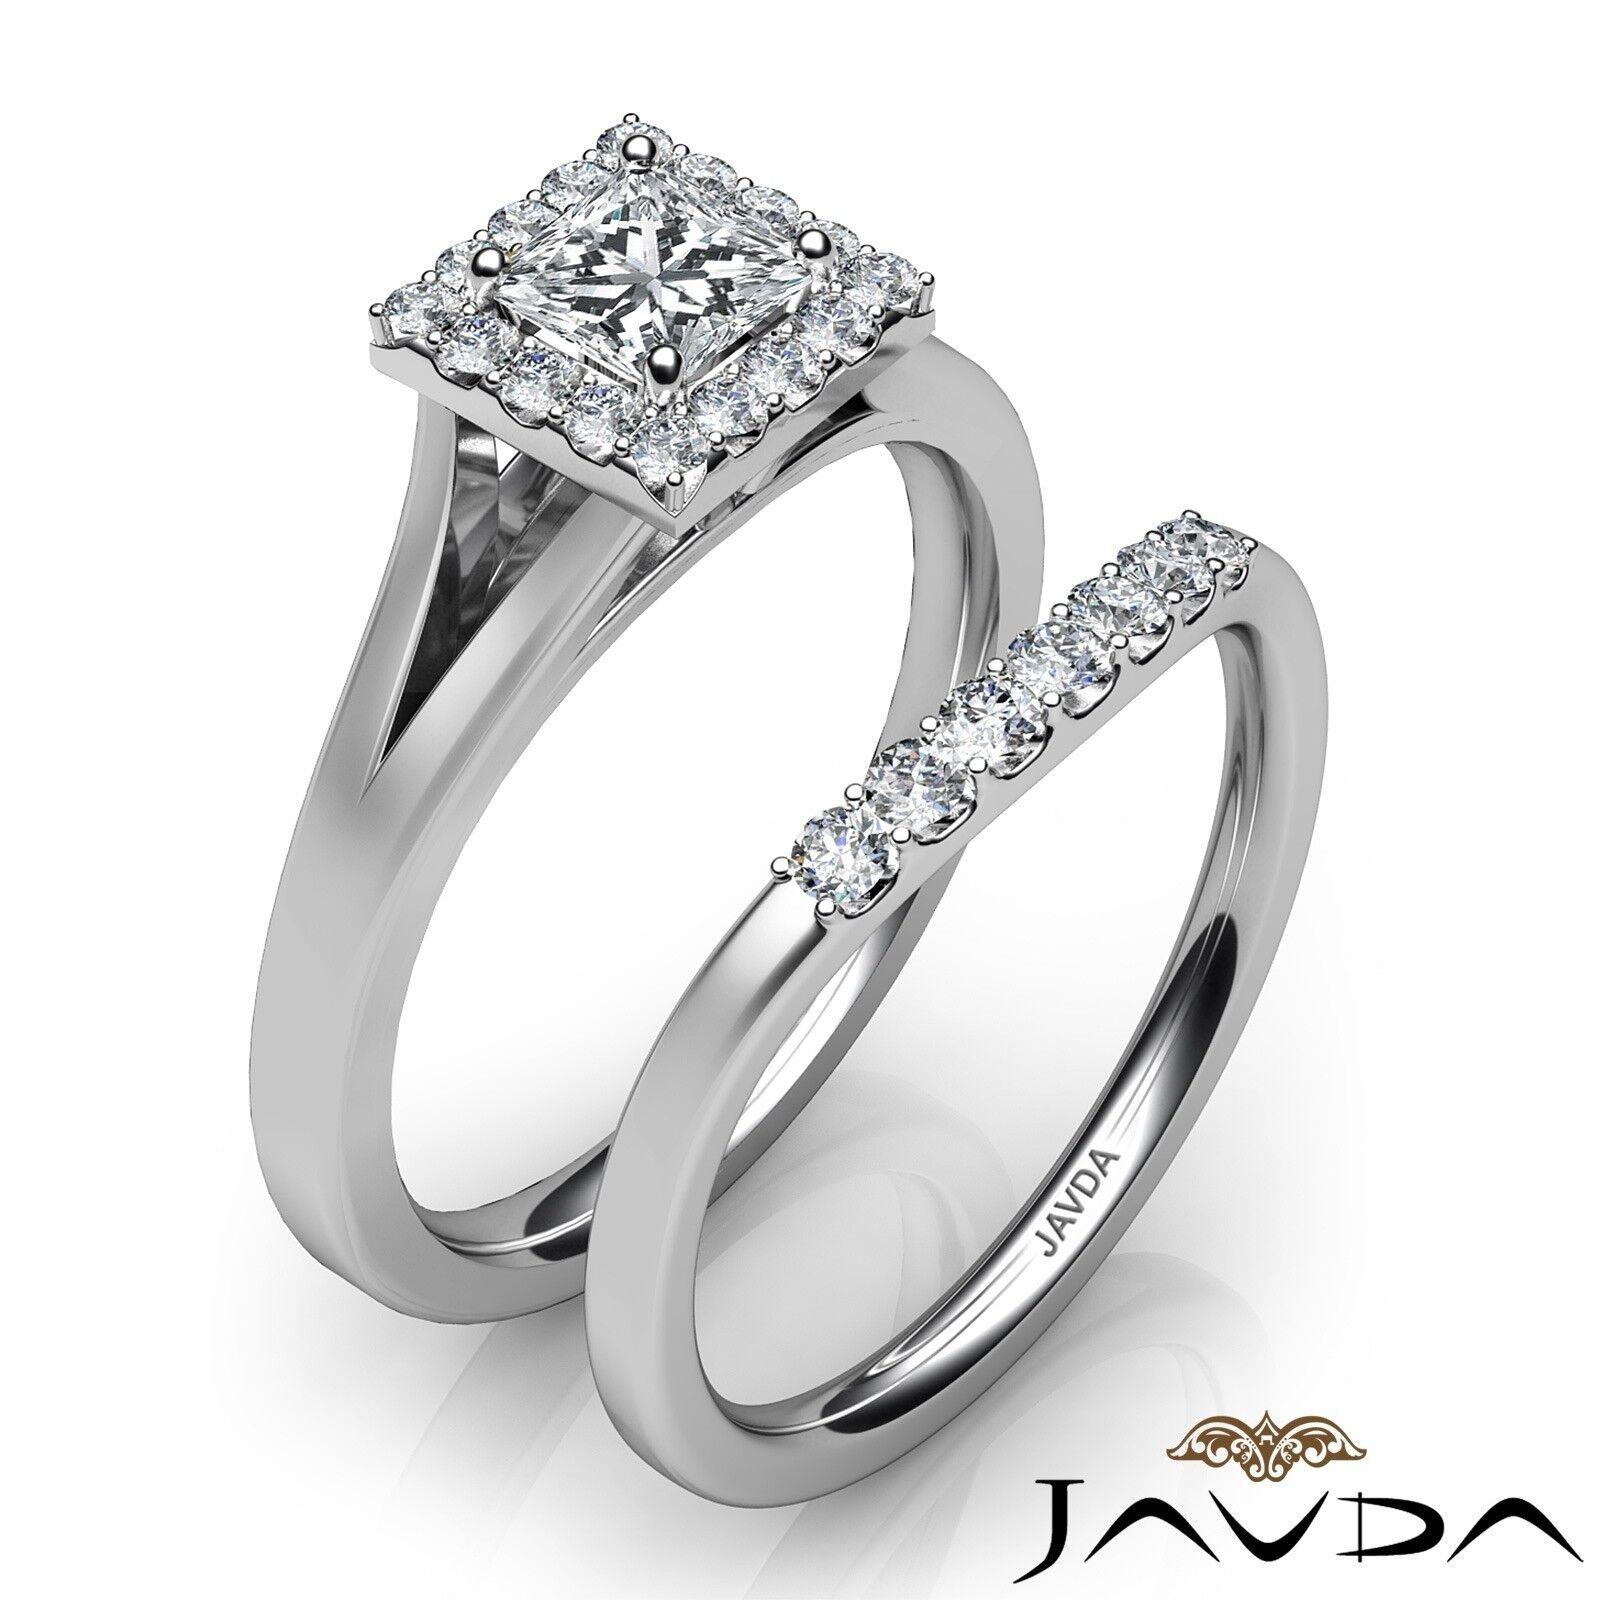 0.93ctw Halo Pave Bridal Princess Diamond Engagement Ring GIA F-VVS1 White Gold 2